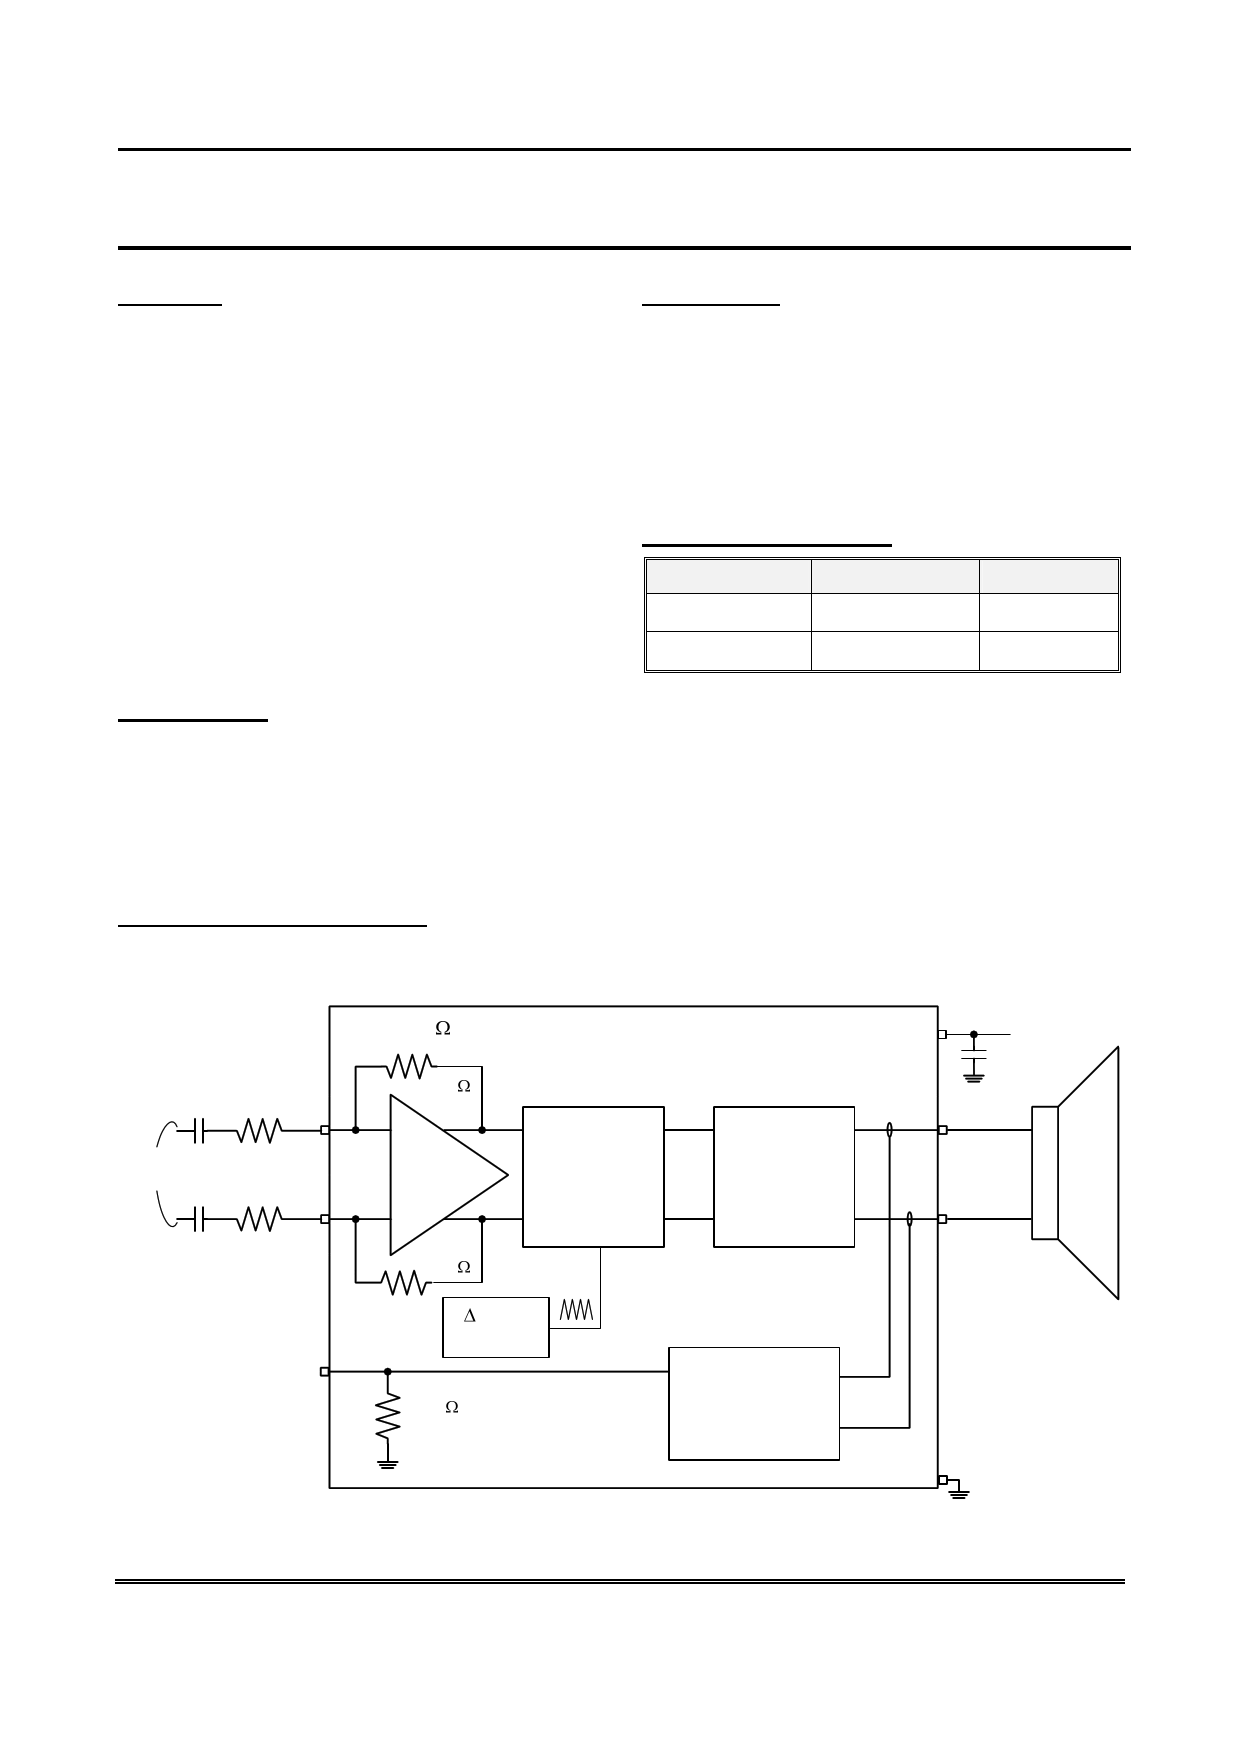 AD5165A Hoja de datos, Descripción, Manual